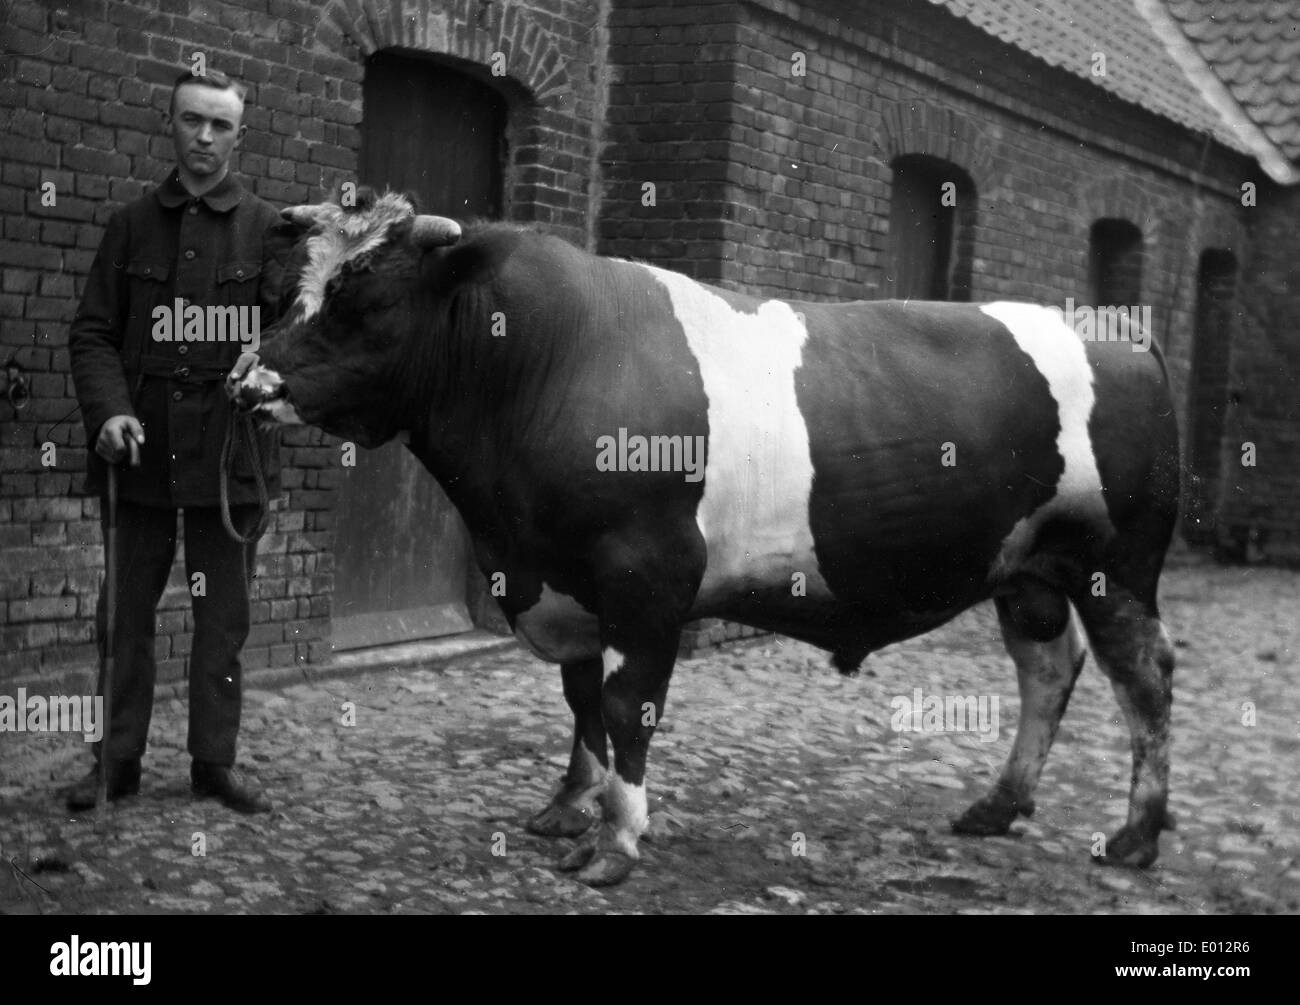 A breeding bull - Stock Image